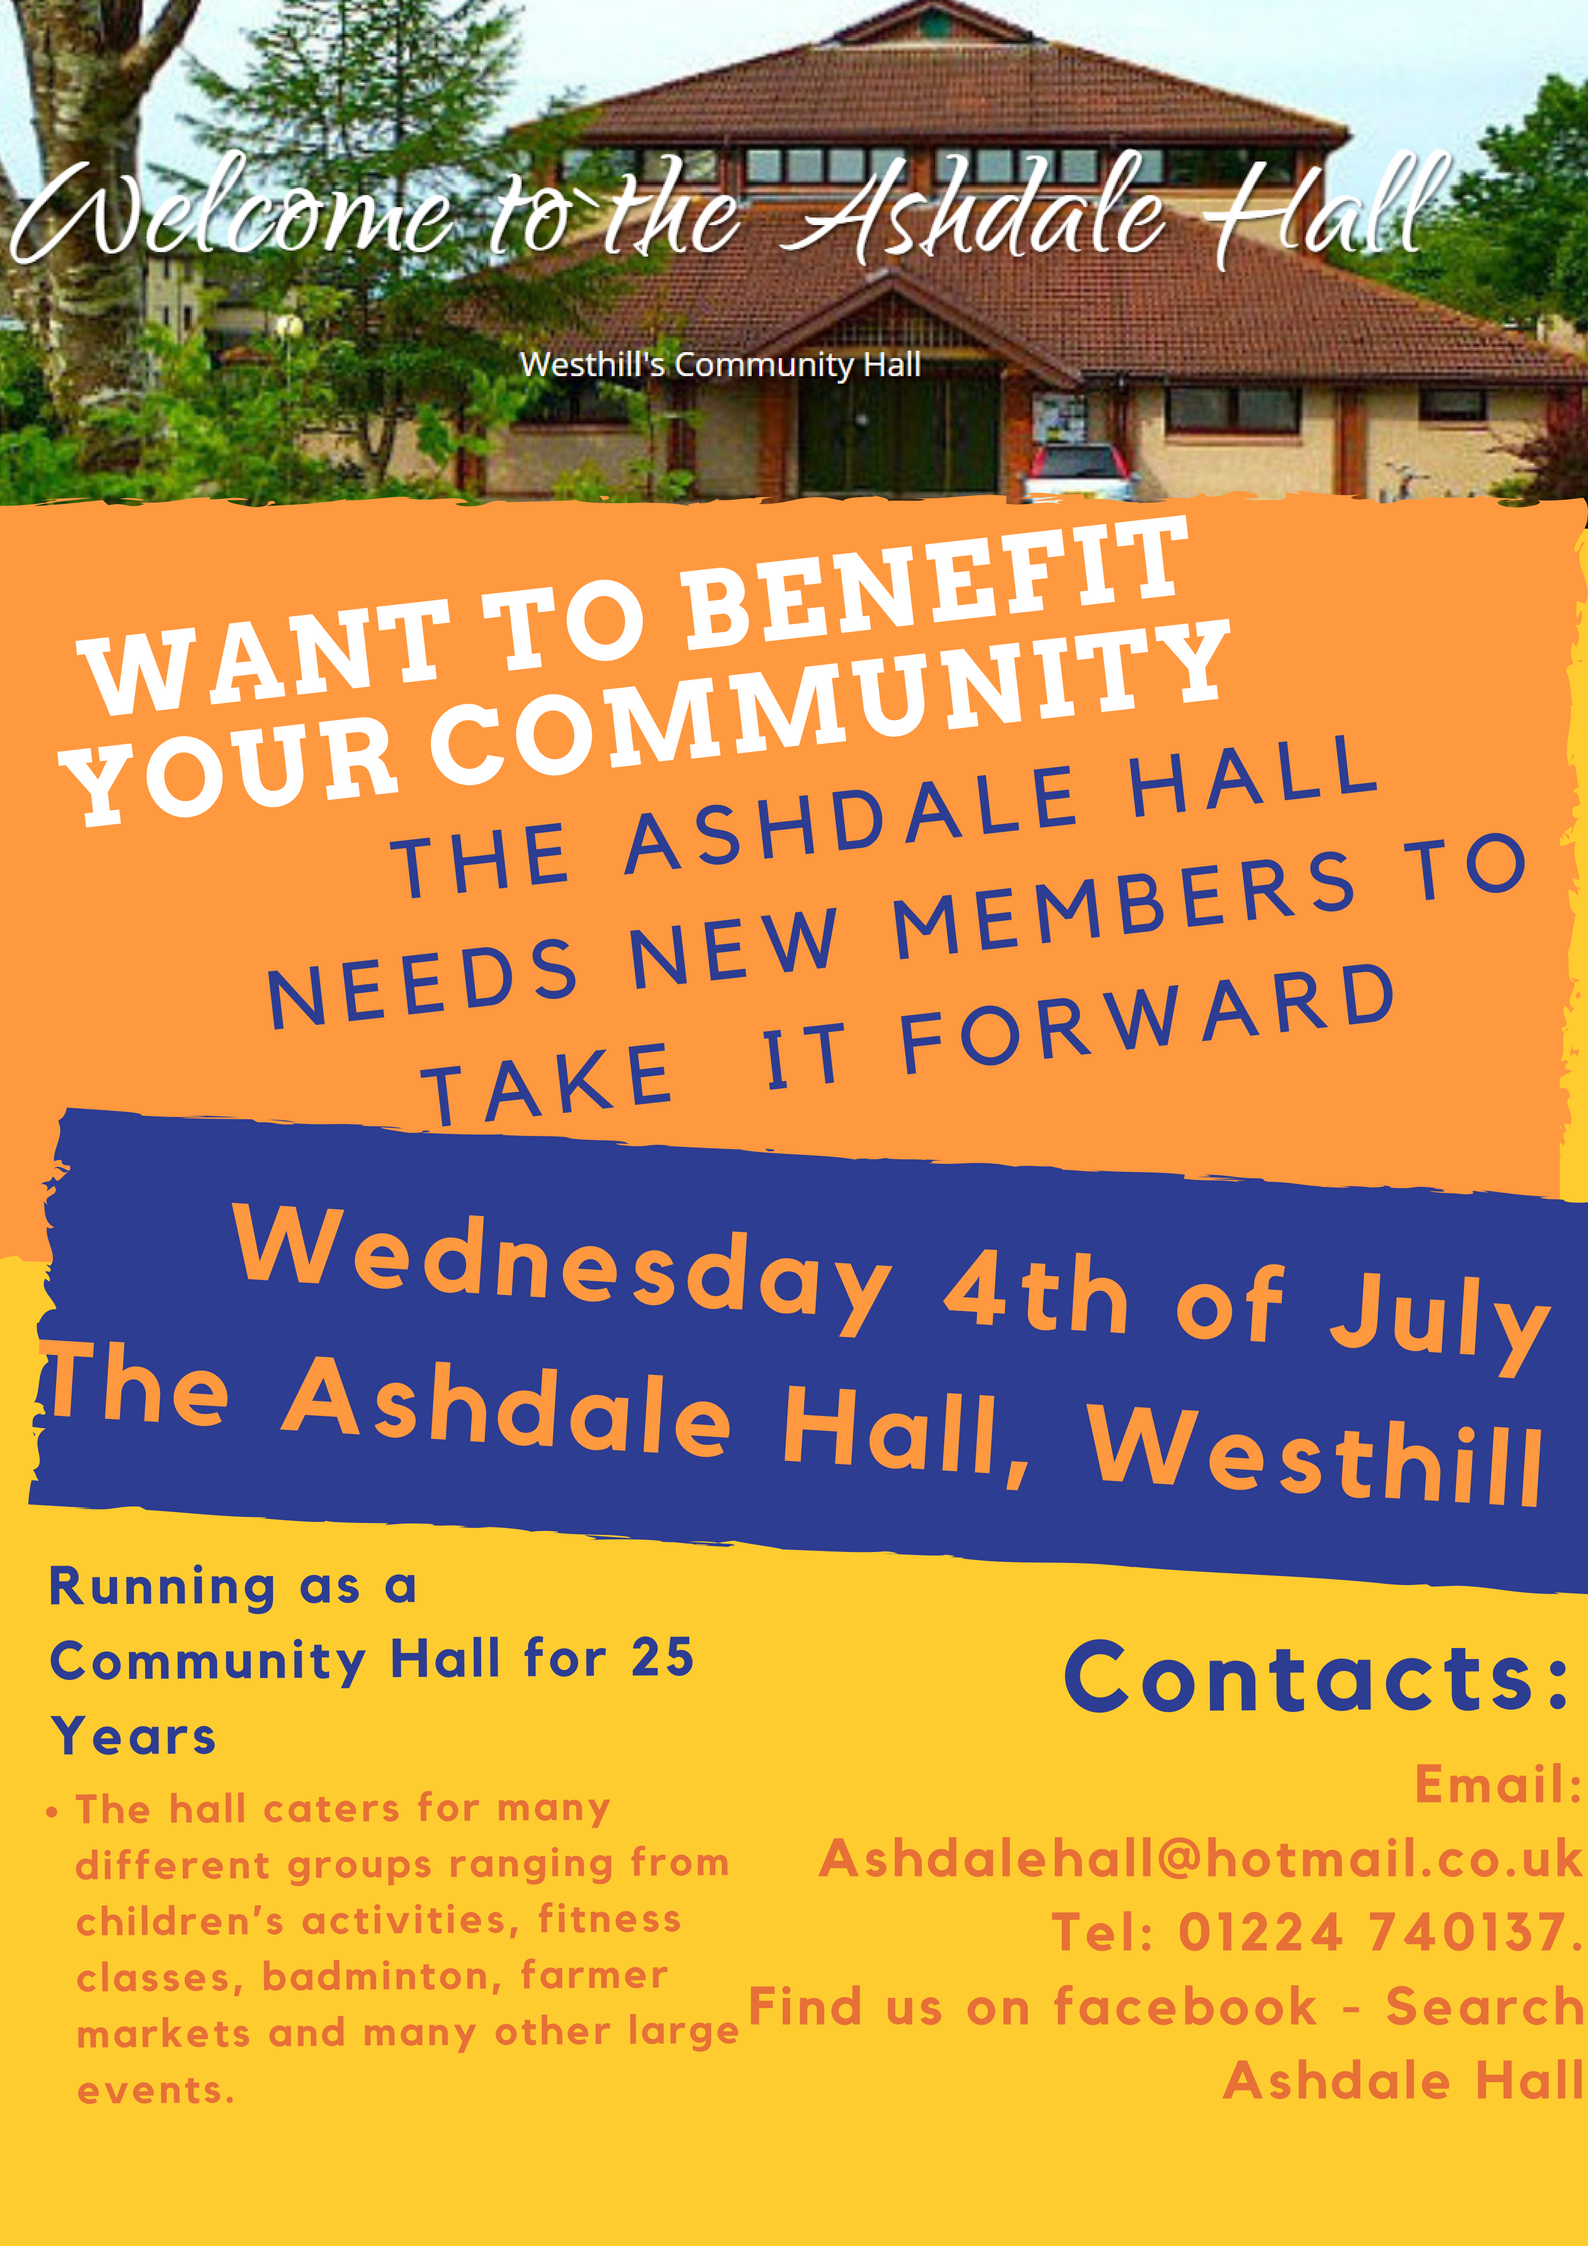 Ashdale Hall Meeting 4th July